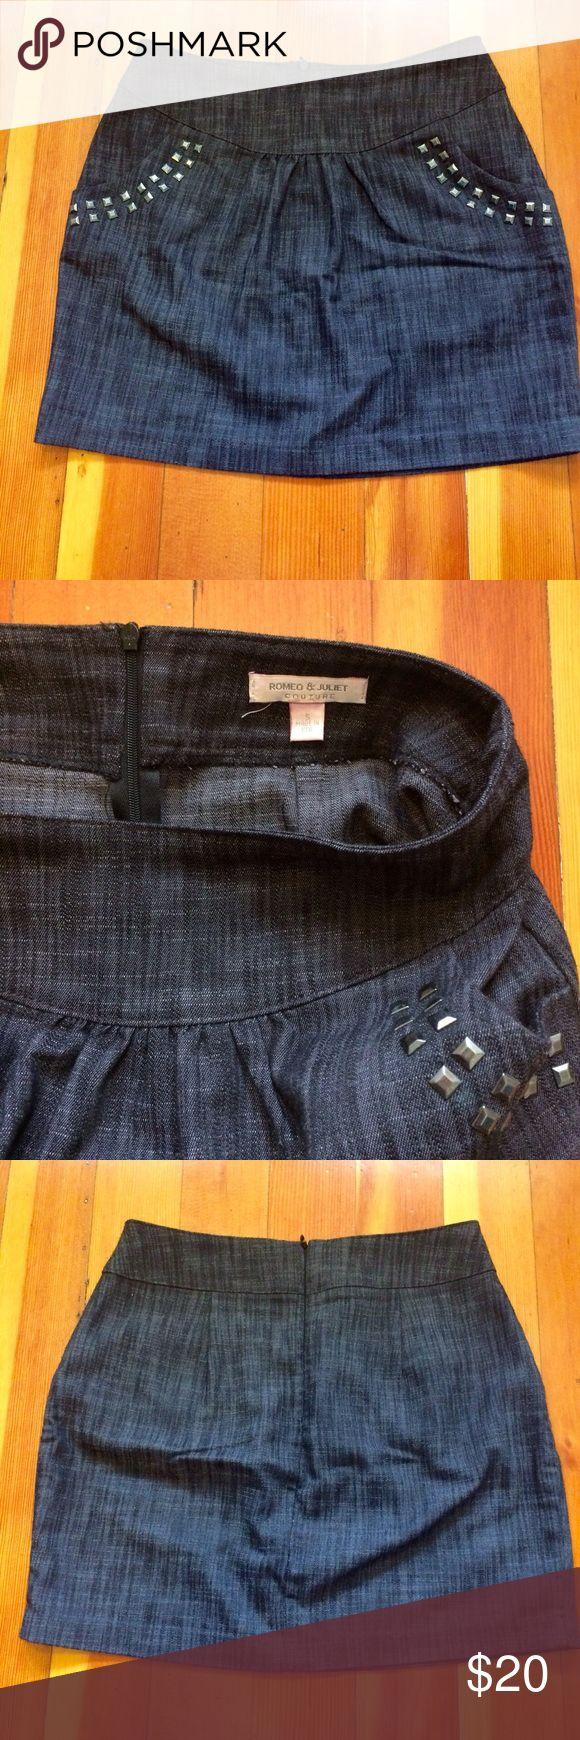 Romeo & Juliet Couture jean mini skirt Romeo & Juliet Couture jean mini skirt with side pockets and back zipper. Size S. Made in USA. Like new. Romeo & Juliet Couture Skirts Mini